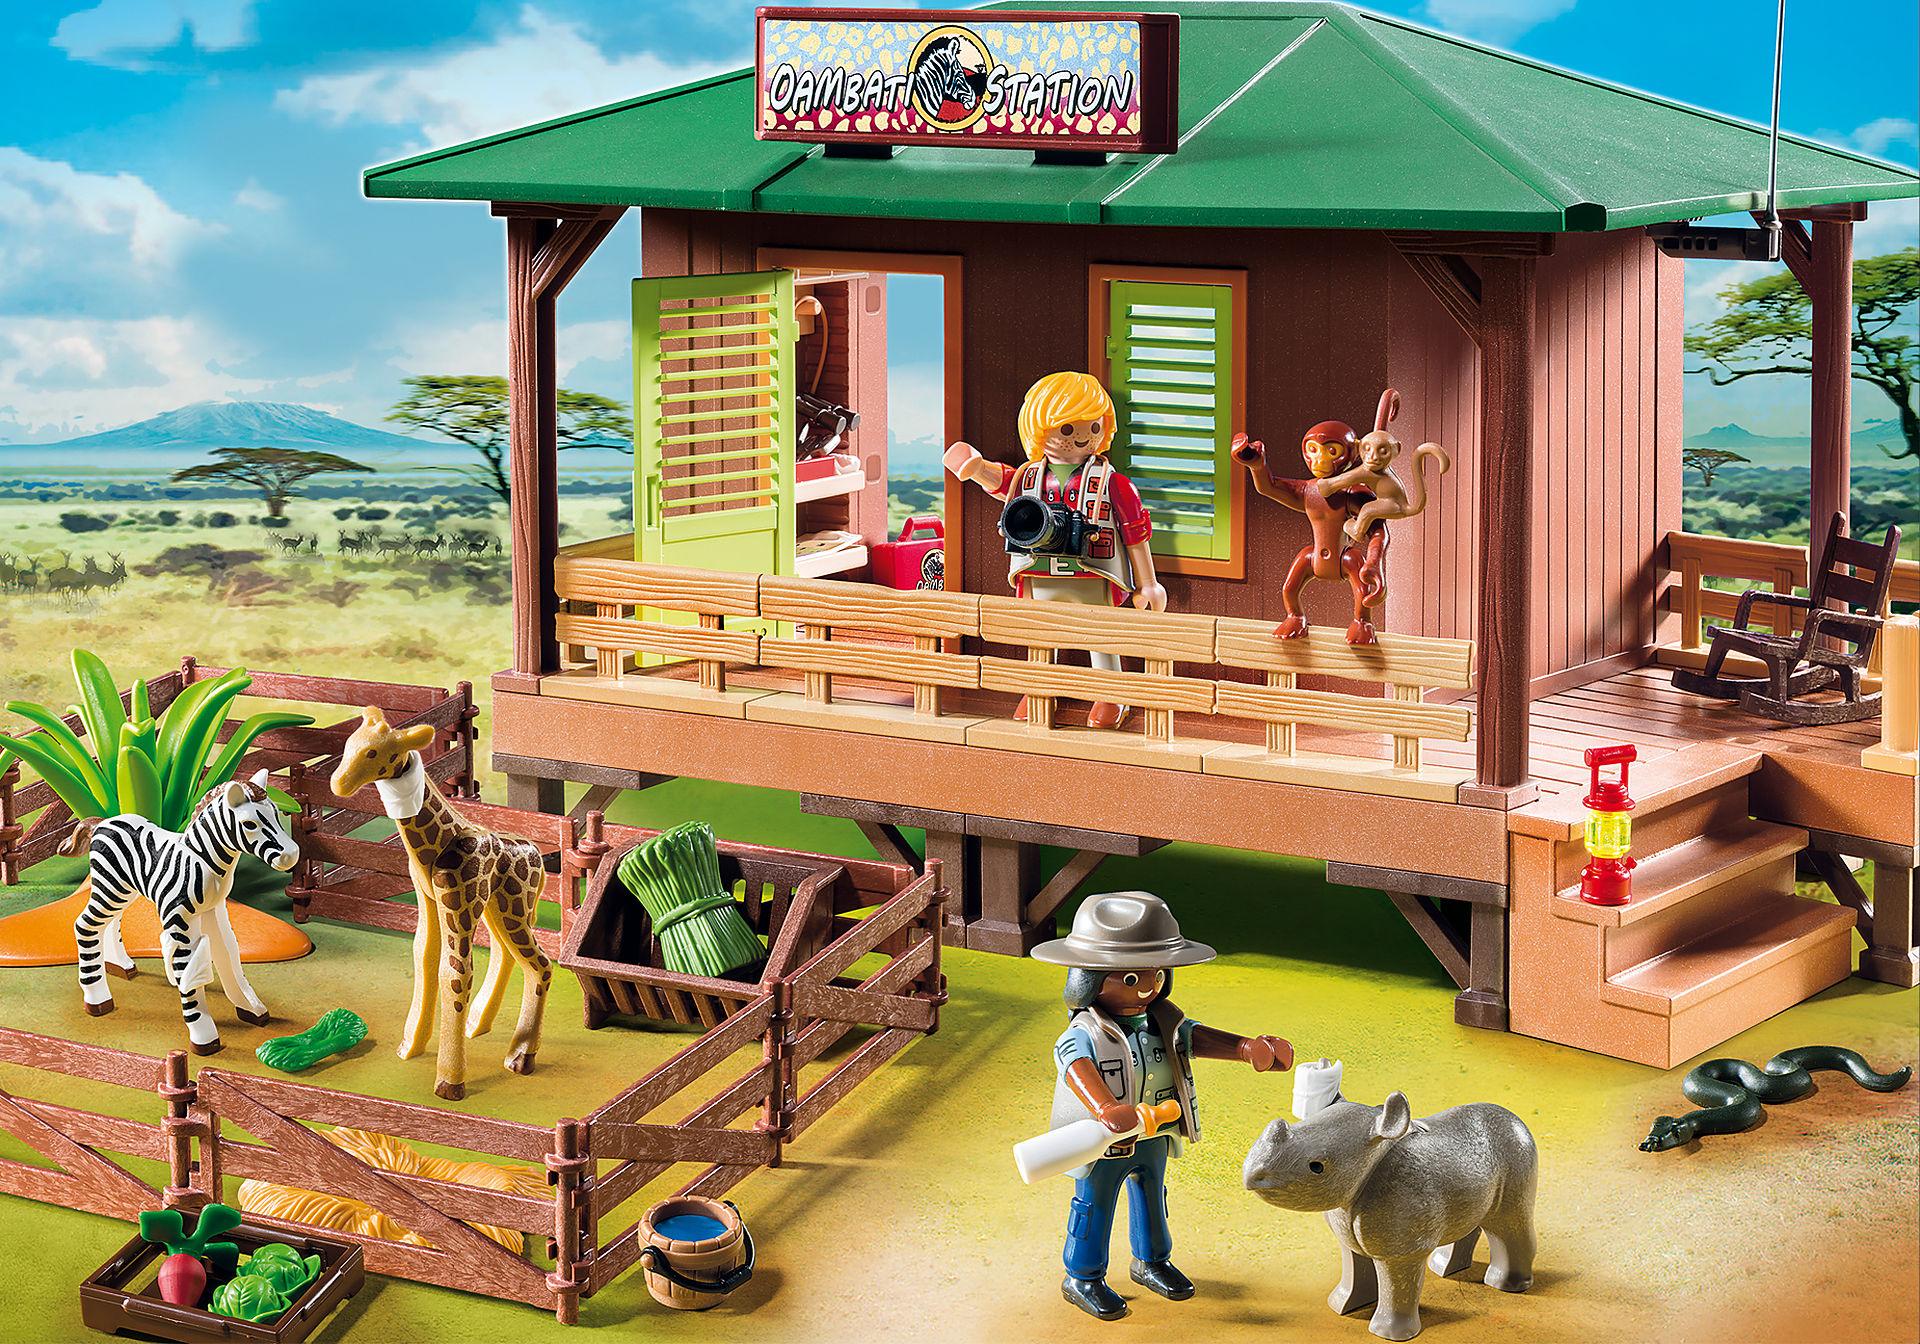 http://media.playmobil.com/i/playmobil/6936_product_detail/Rangerstation mit Tieraufzucht